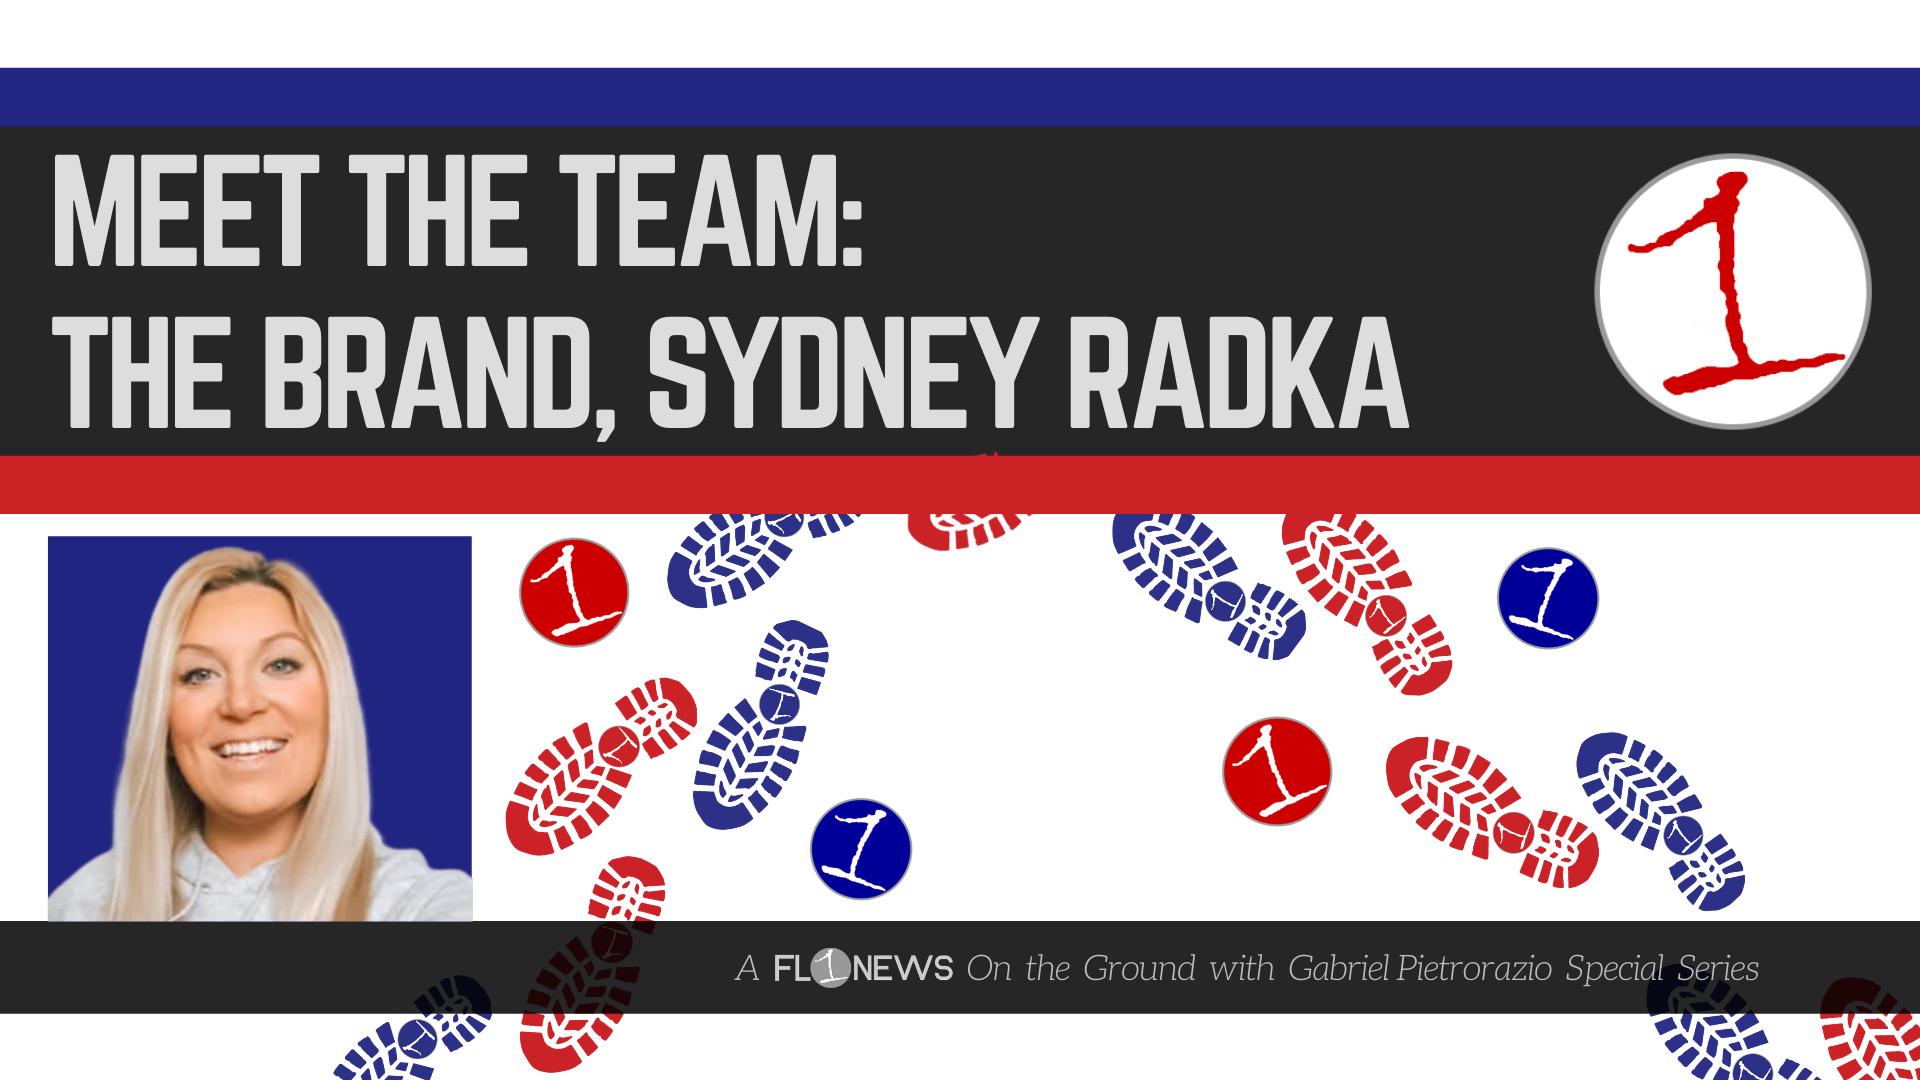 MEET THE TEAM: The Brand, Sydney Radka